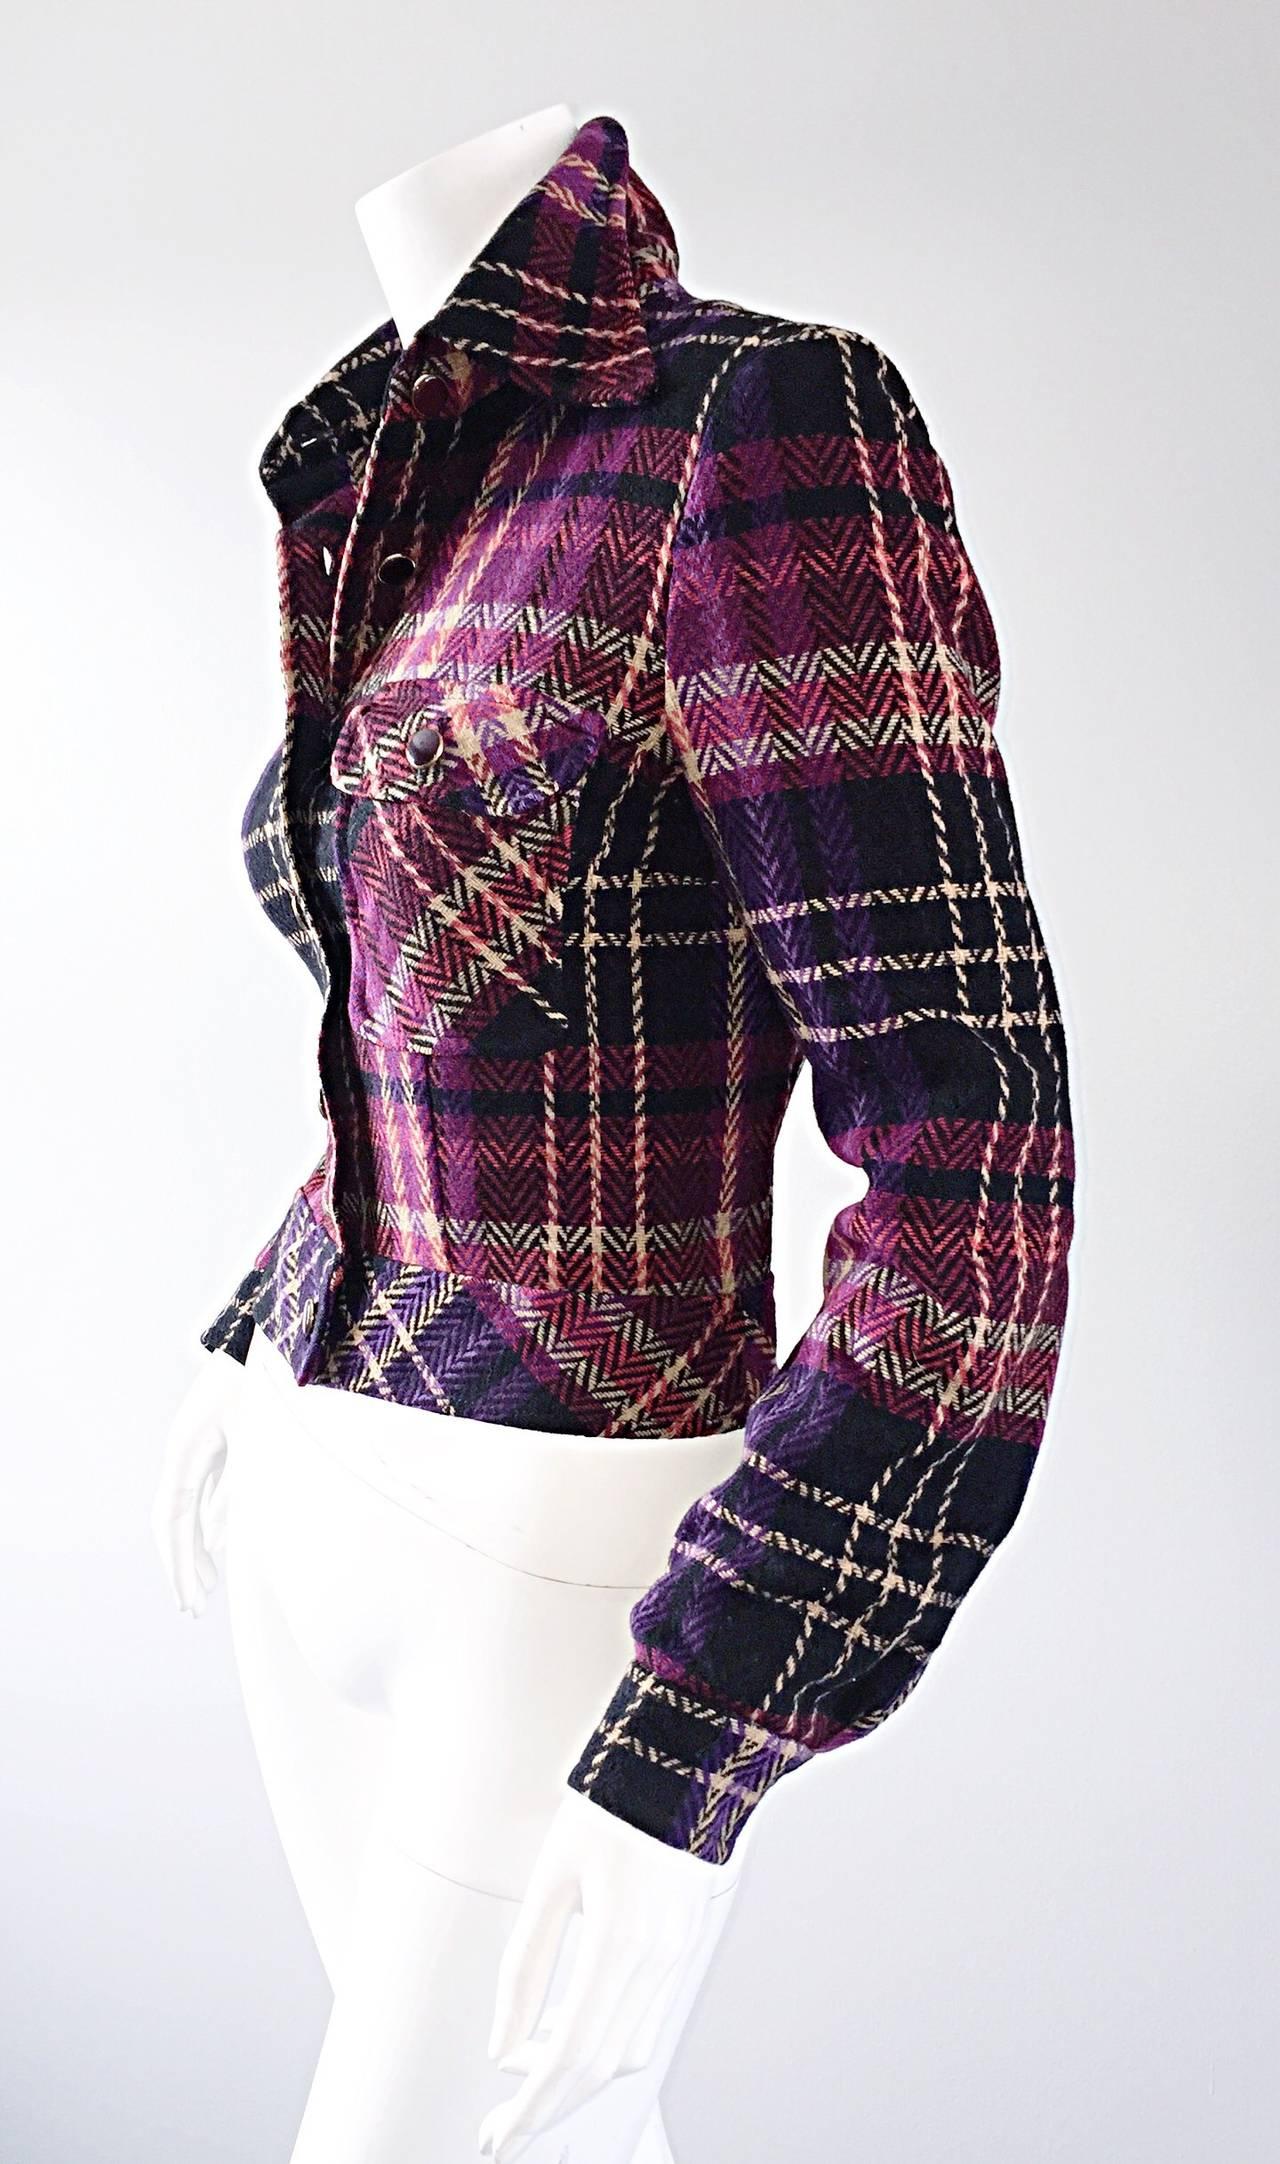 1970s Vintage Addena for I. Magnin Pink + Purple Plaid Herringbone Wool Jacket 7